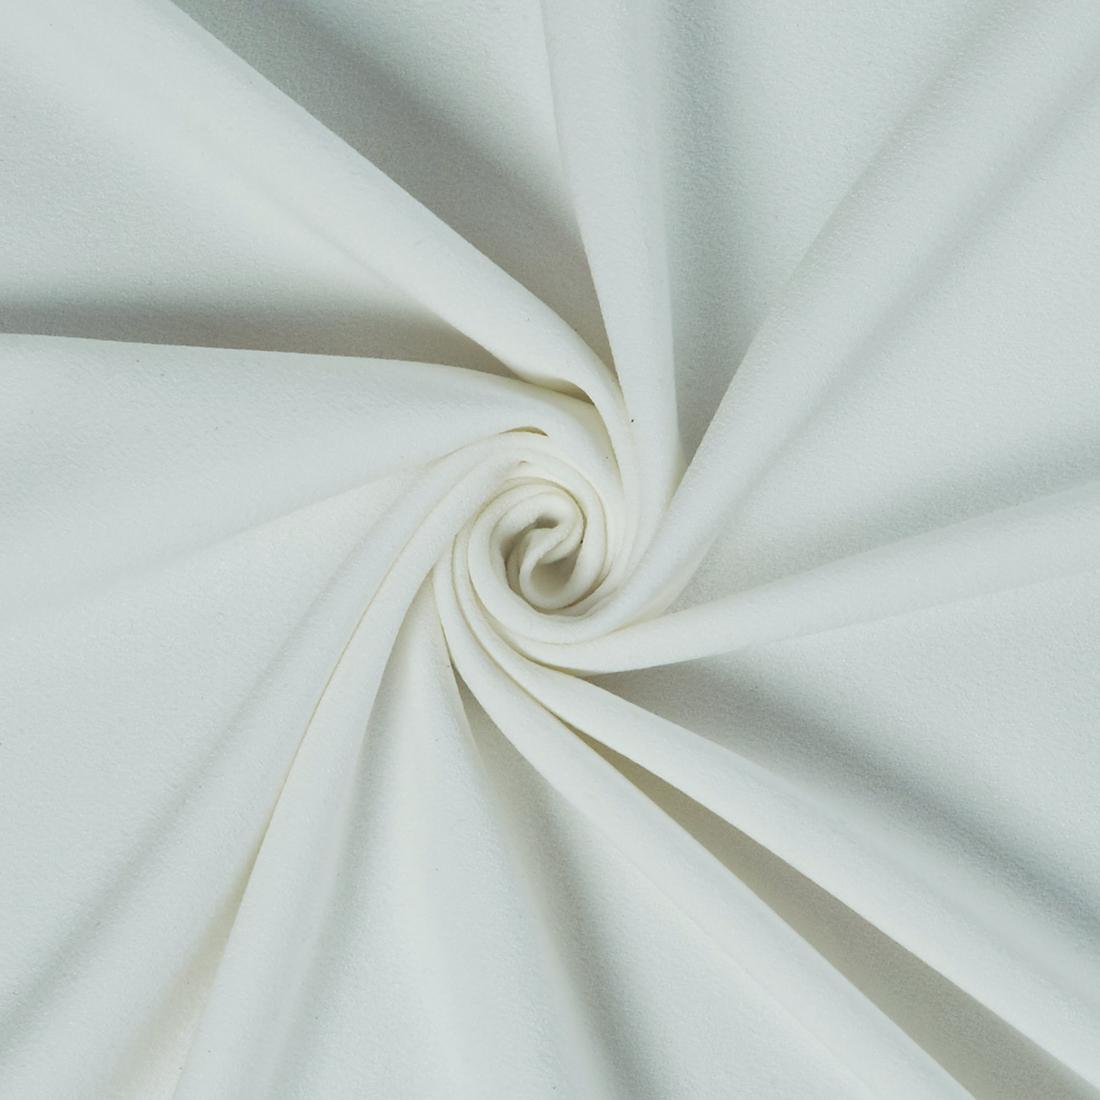 Moss Crepe Ivory Dress Fabric